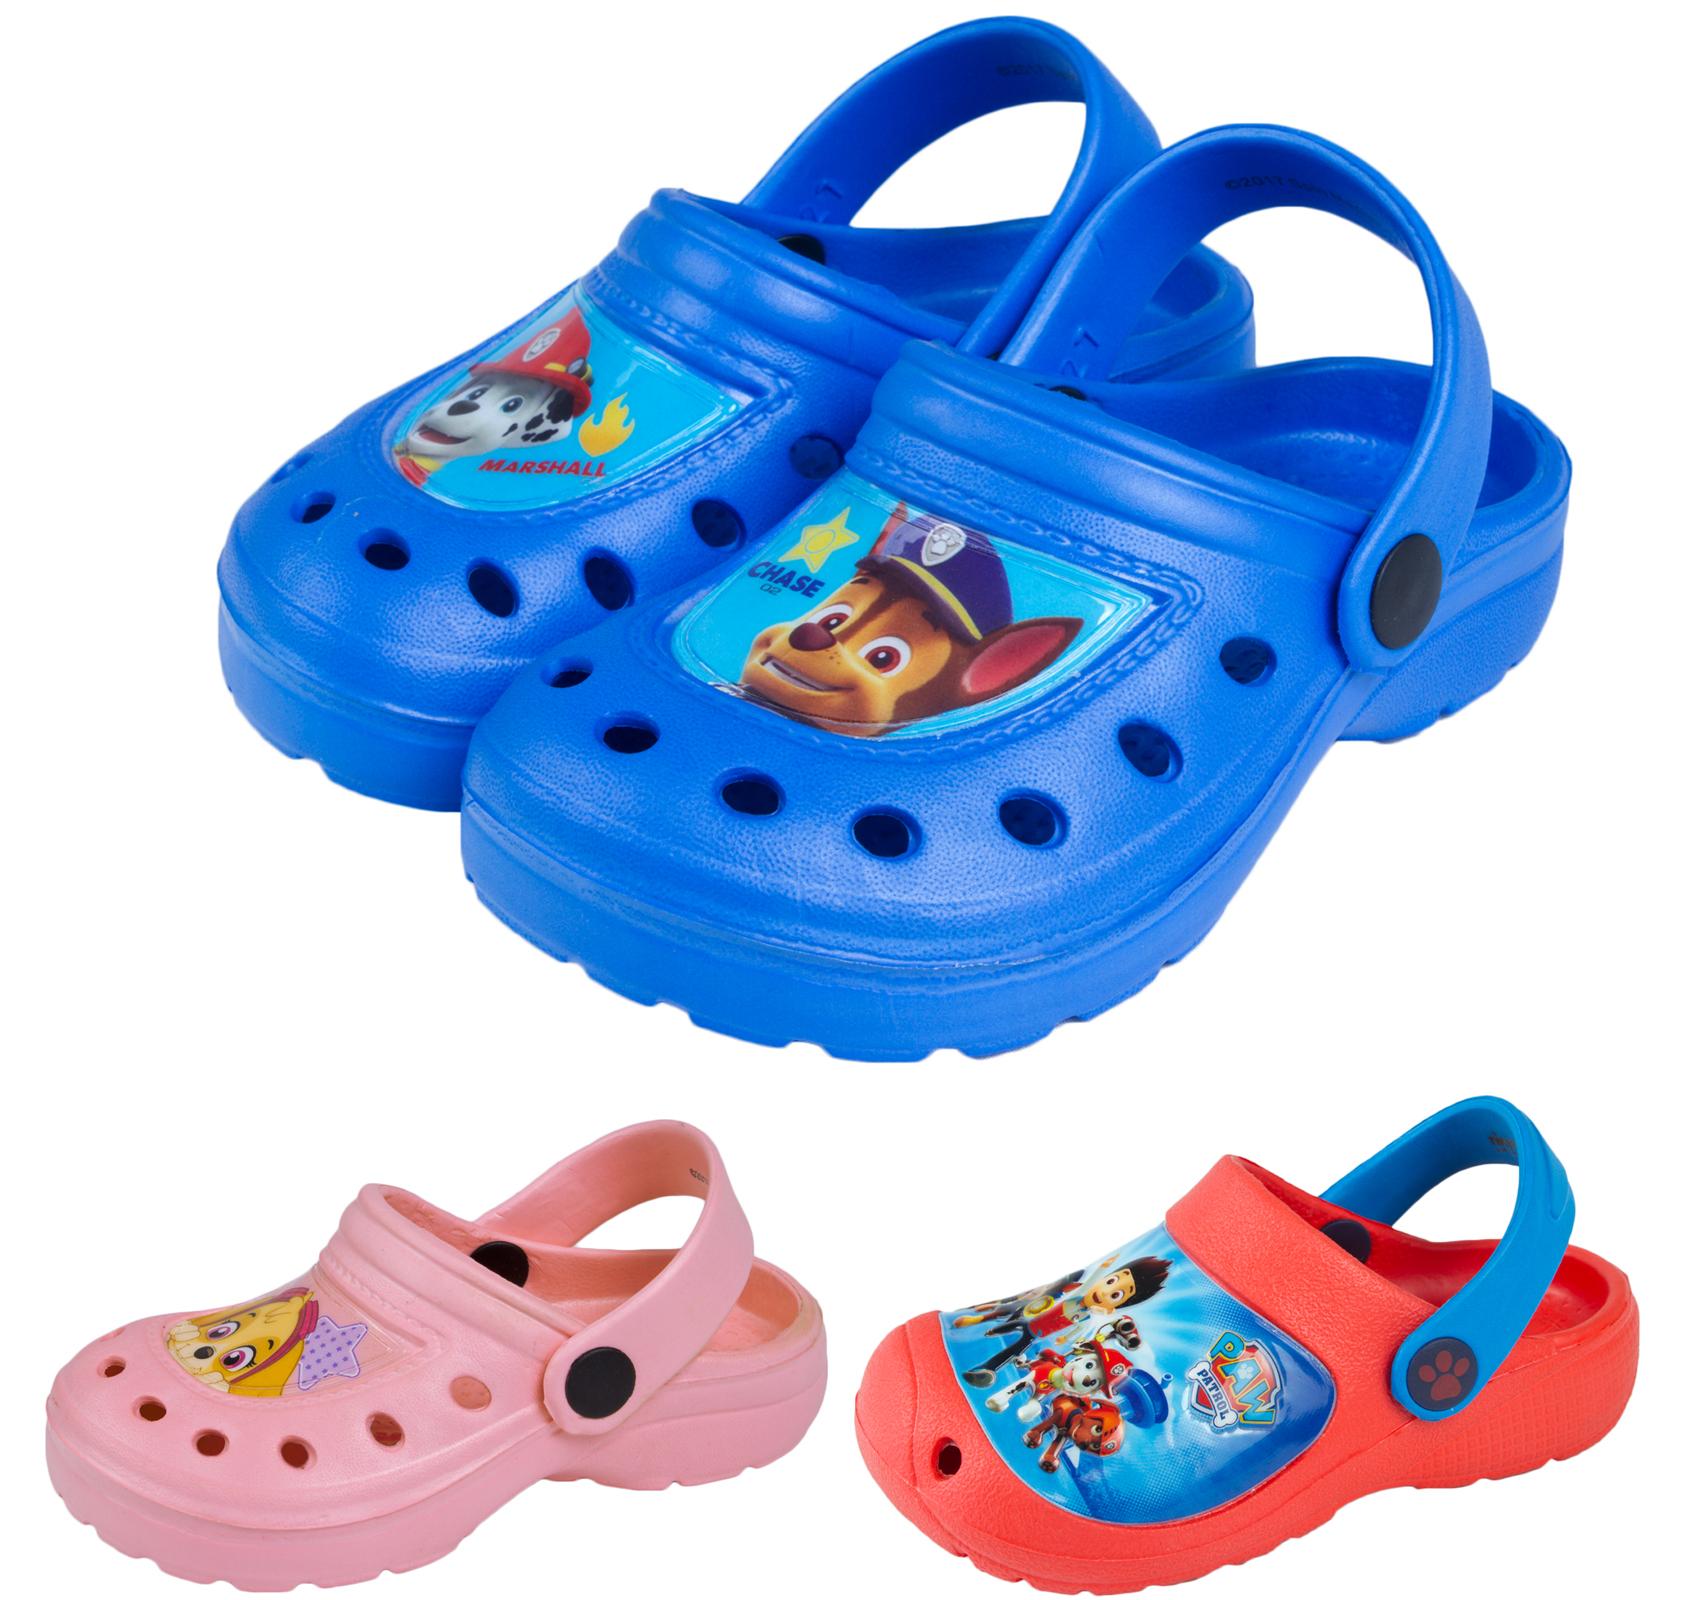 Paw Patrol Clogs Boys Girls Beach Sandals Flat Shoes Mules Kids